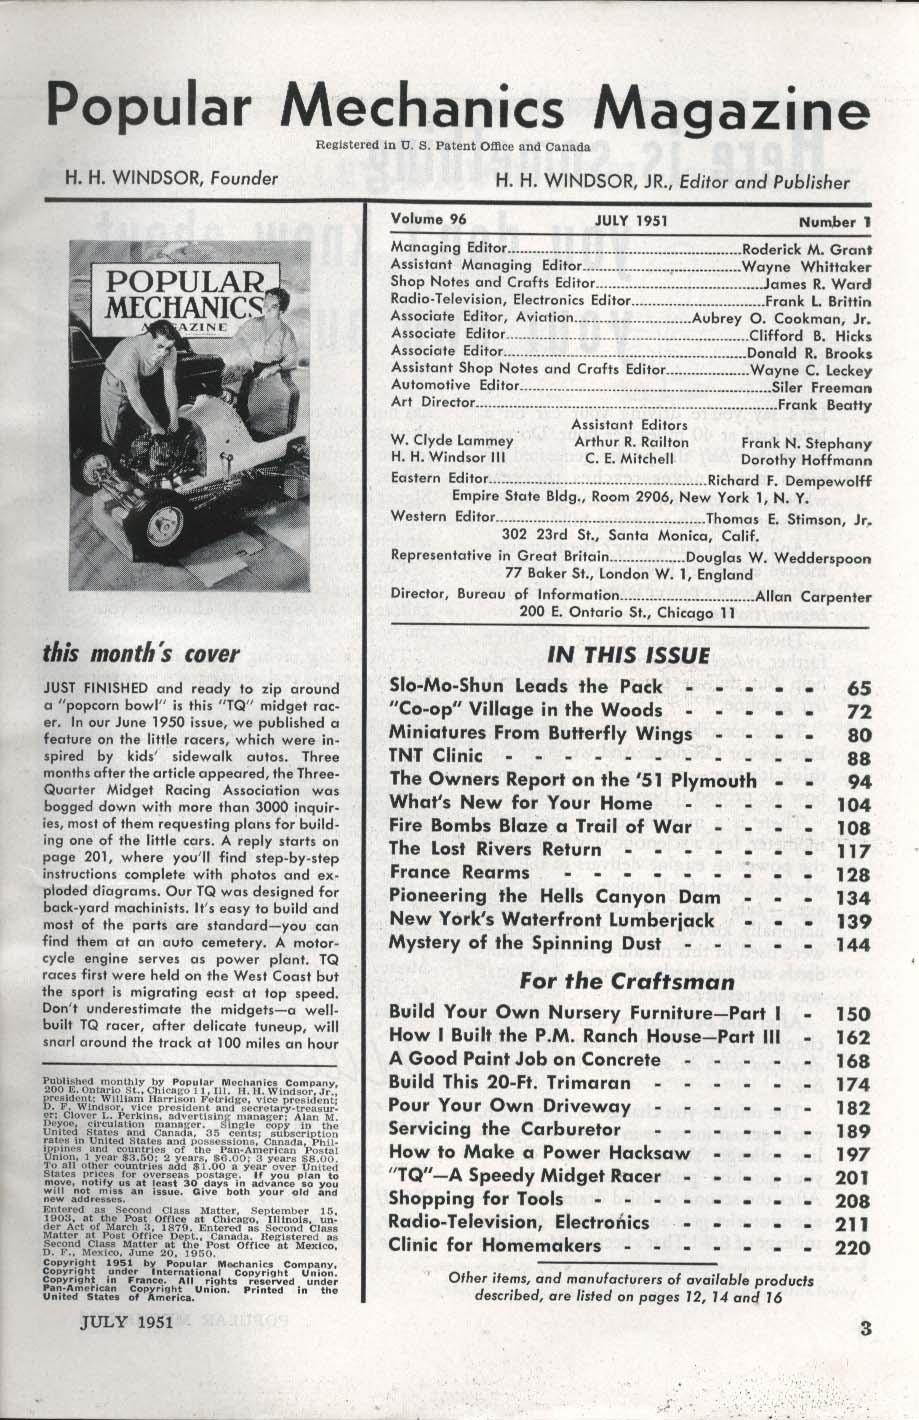 POPULAR MECHANICS Power-Boat Speedster Butterfly Wing Miniature Fire Bomb 7 1951